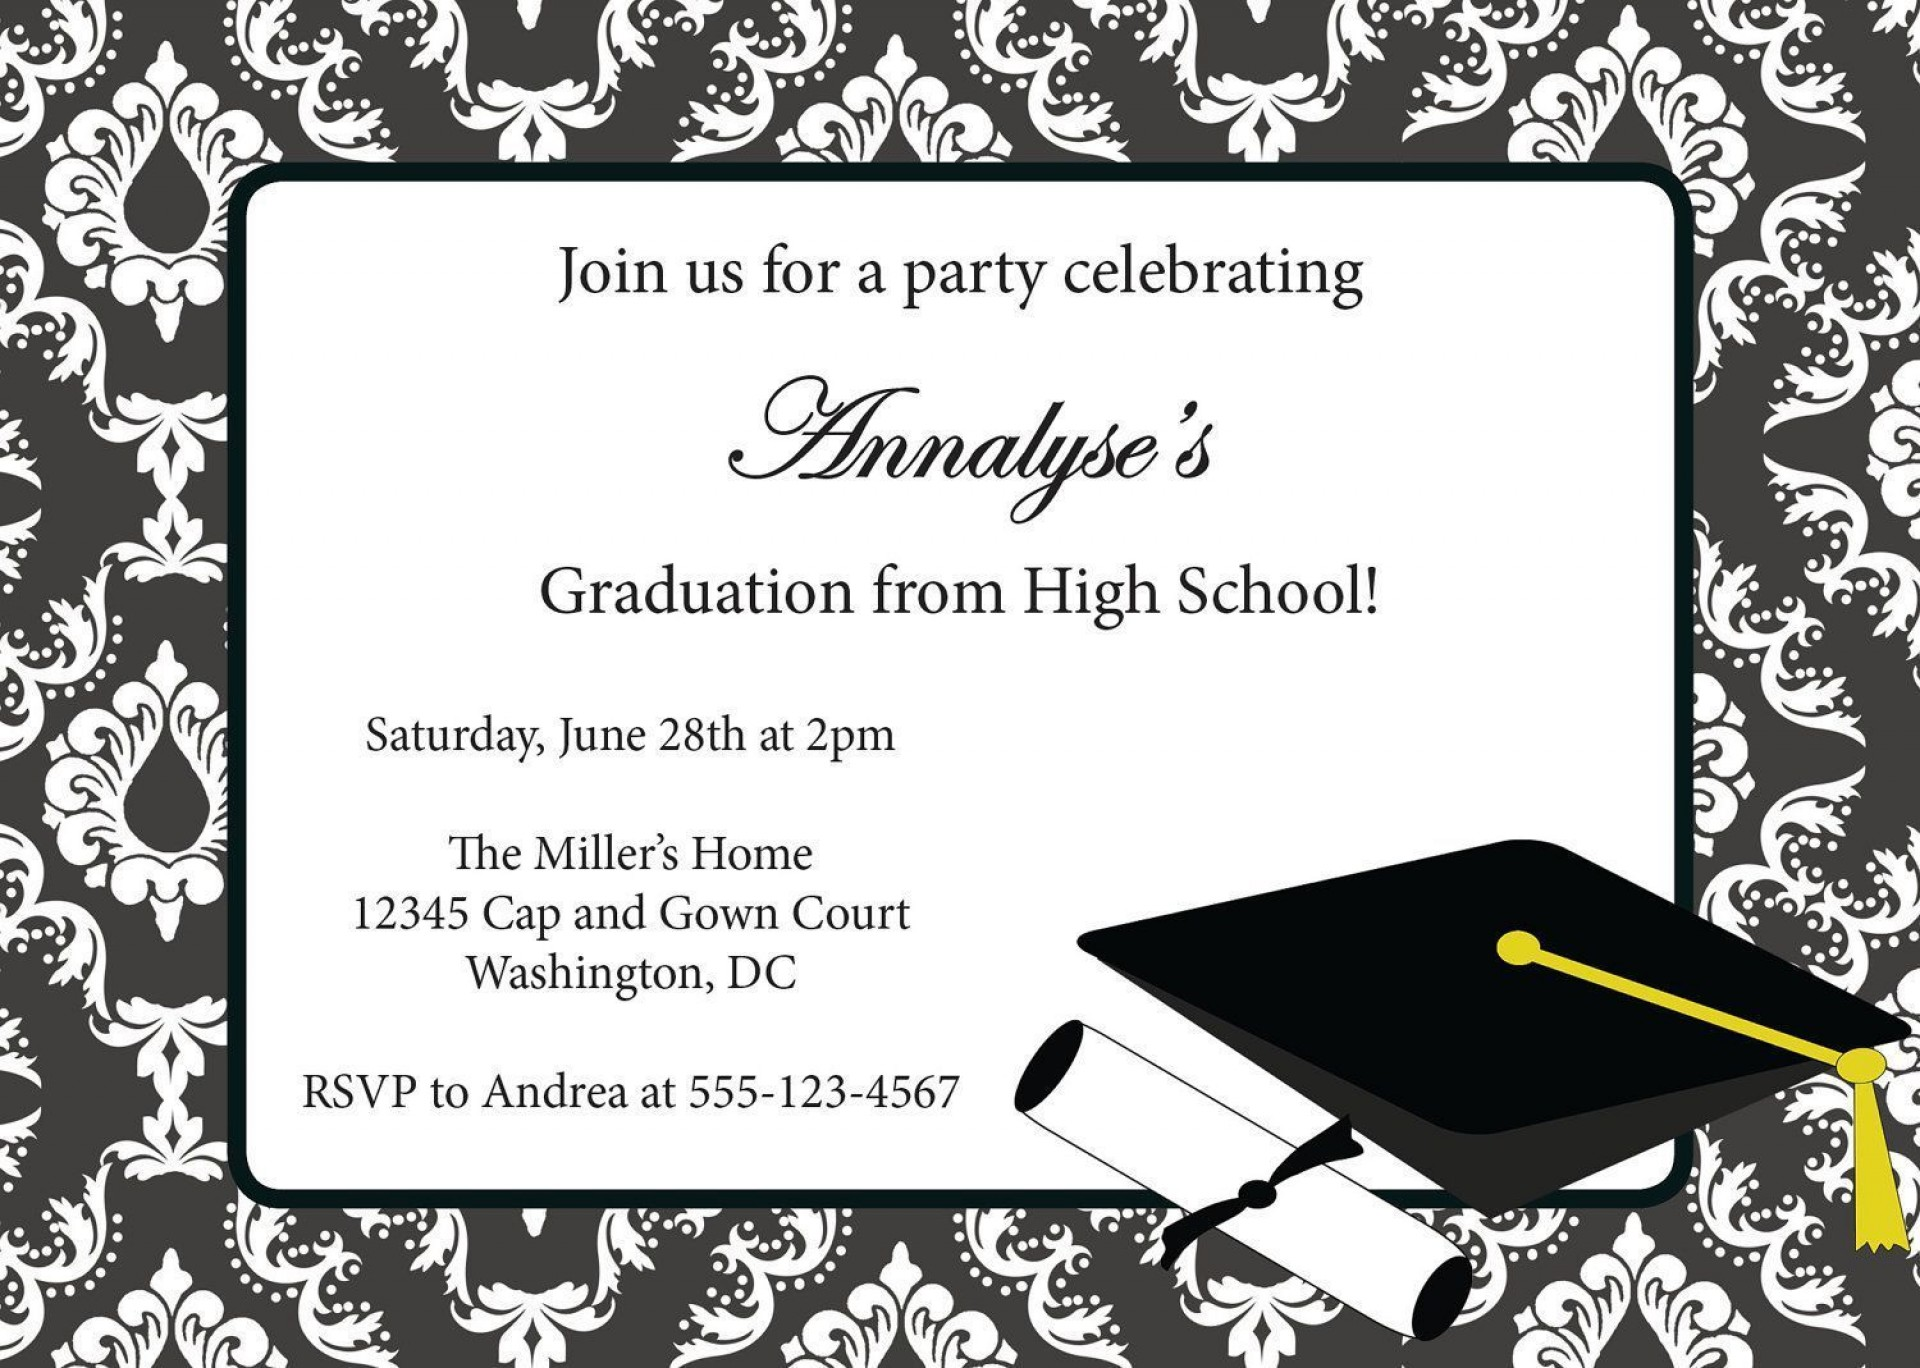 001 Breathtaking Diy Graduation Announcement Template Free Image  Invitation1920